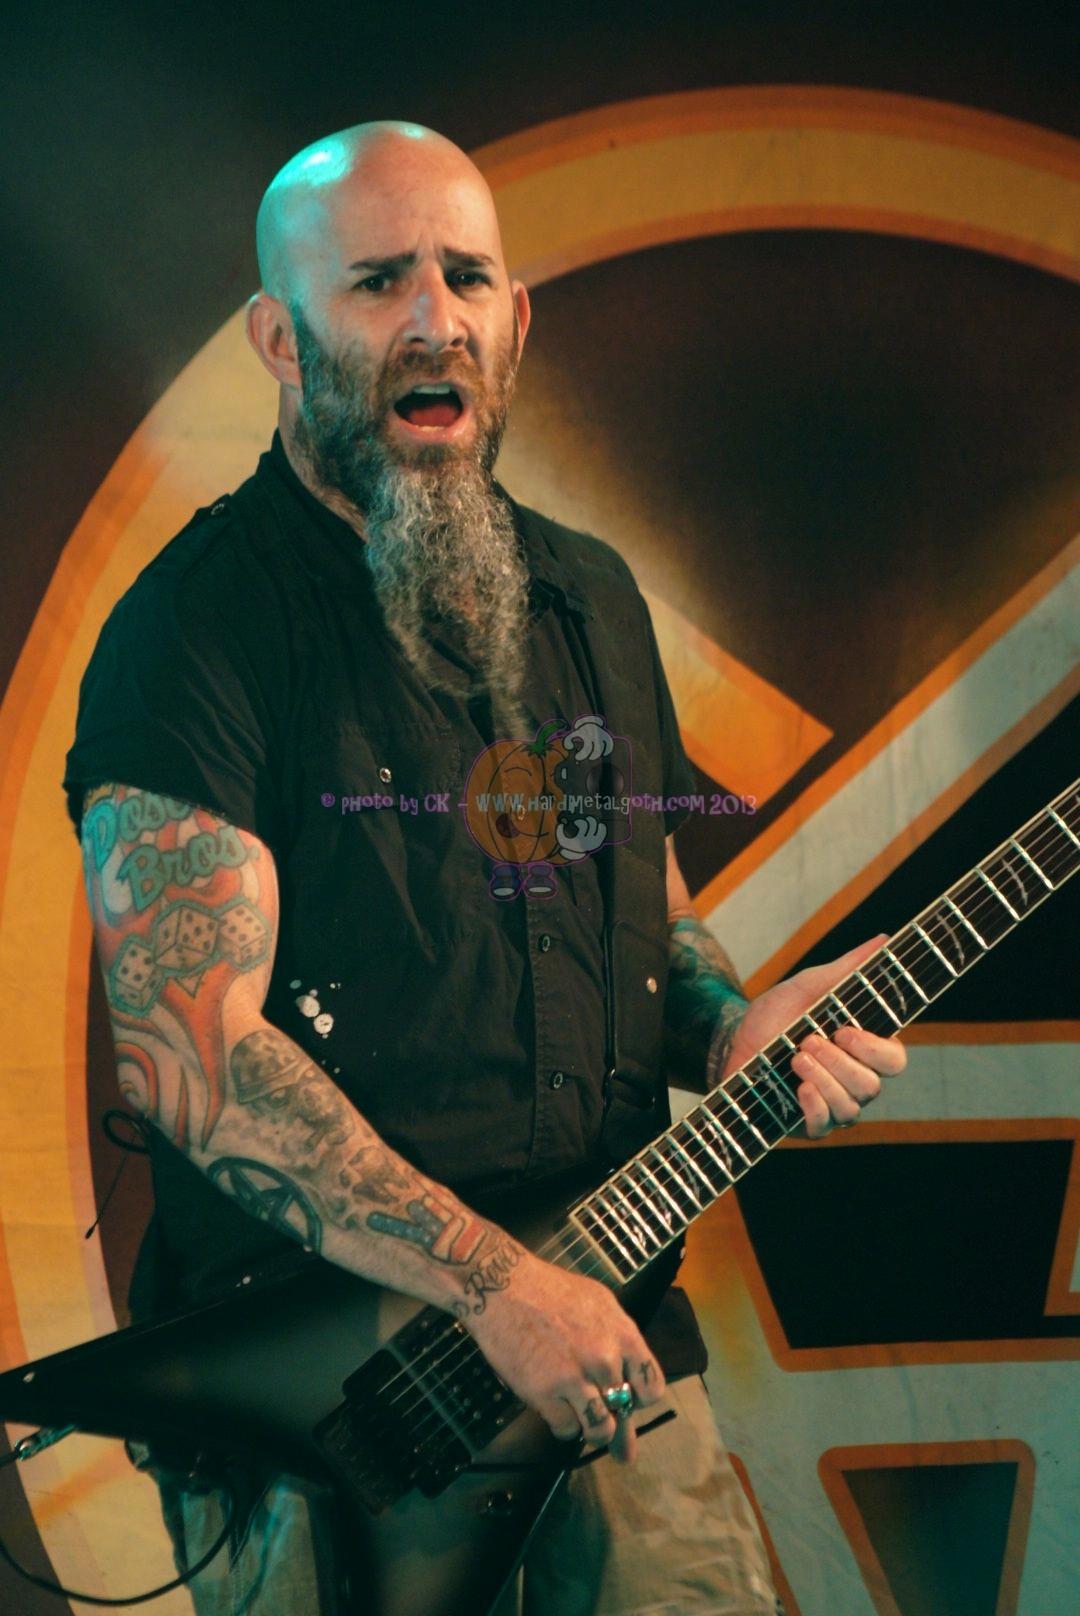 RA_Anthrax29.jpg